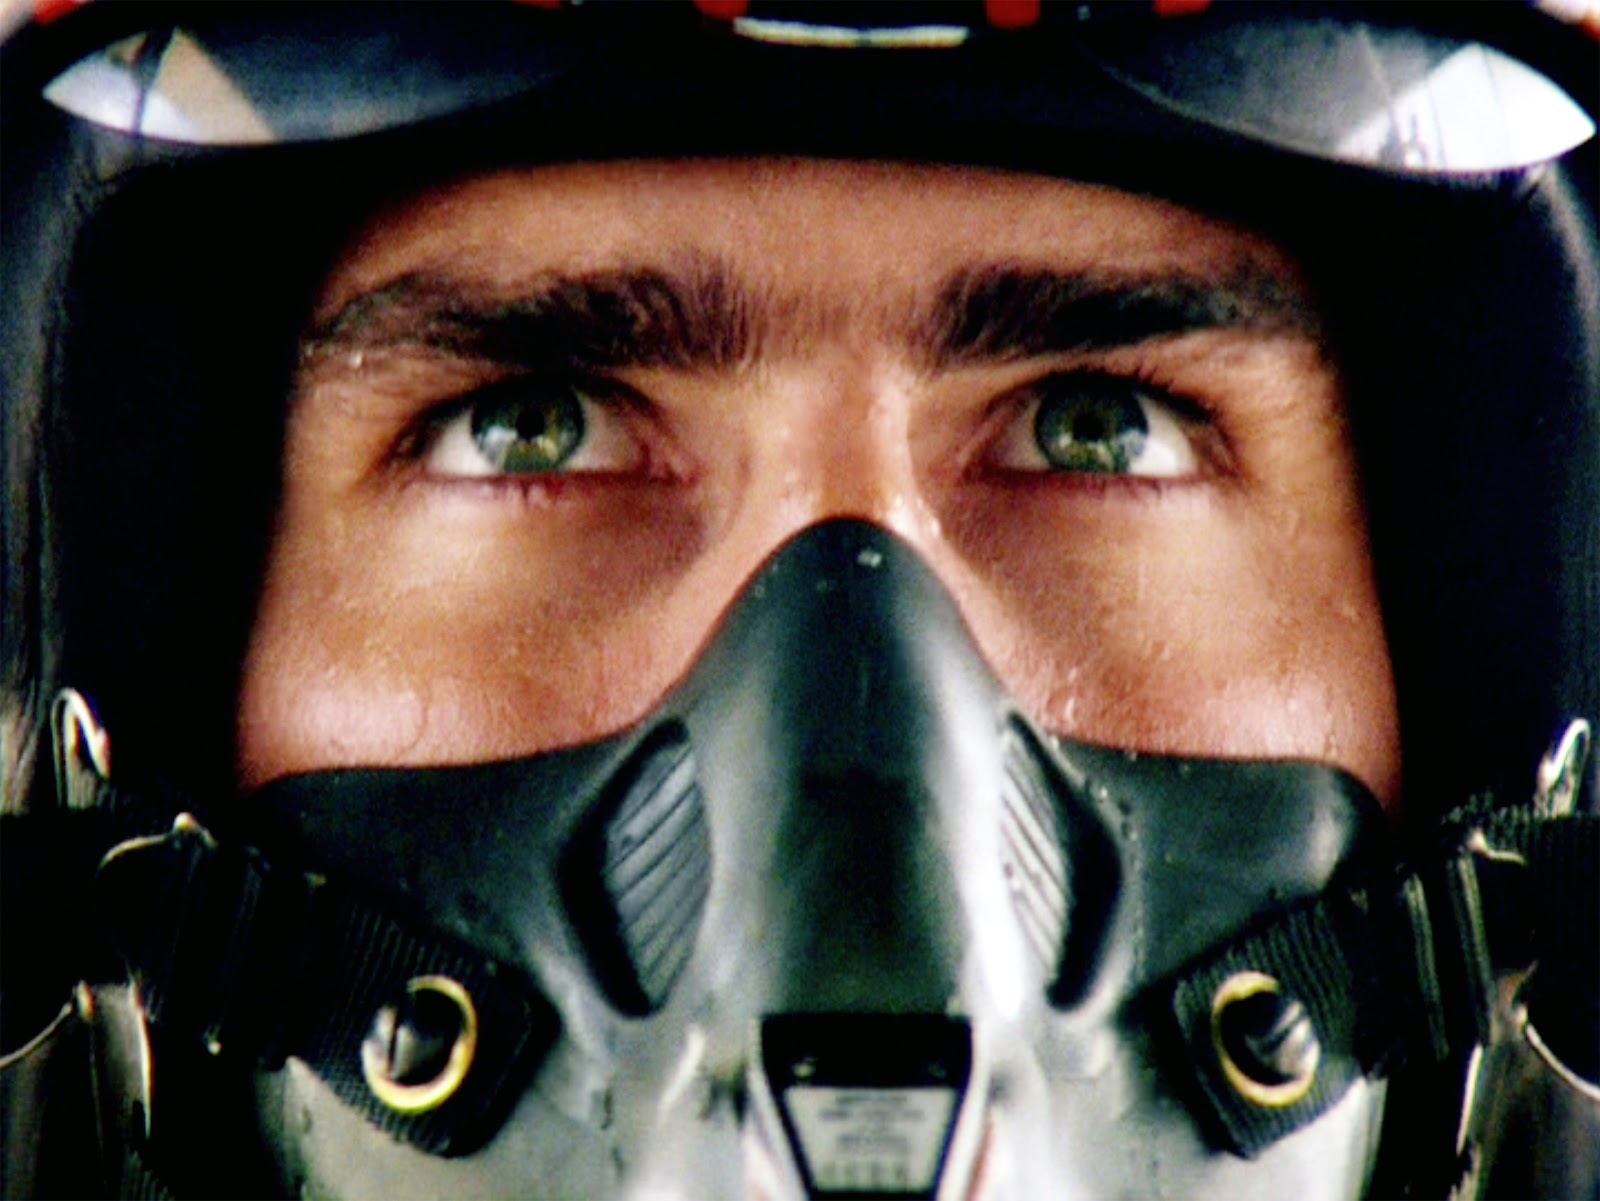 1000+ images about Top Gun on Pinterest | Top gun, Top gun ...